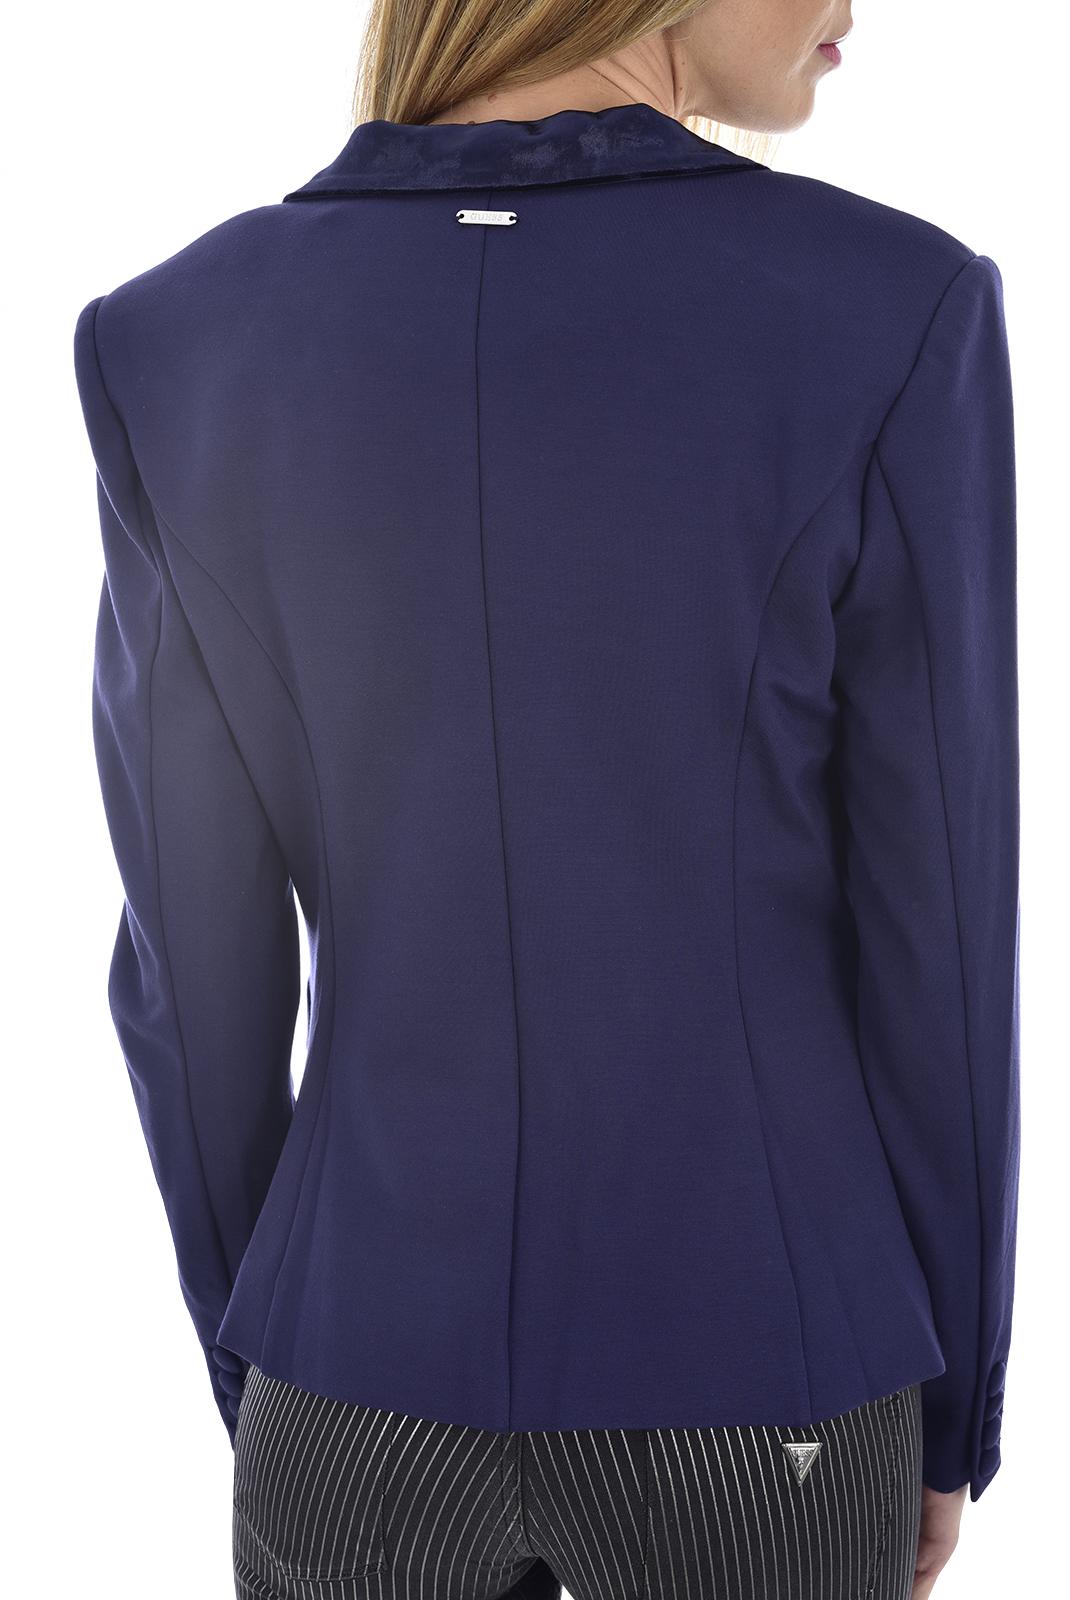 Vestes & blousons  Guess jeans W84N34K54I0 NFBL NIGHTFALL BLUE